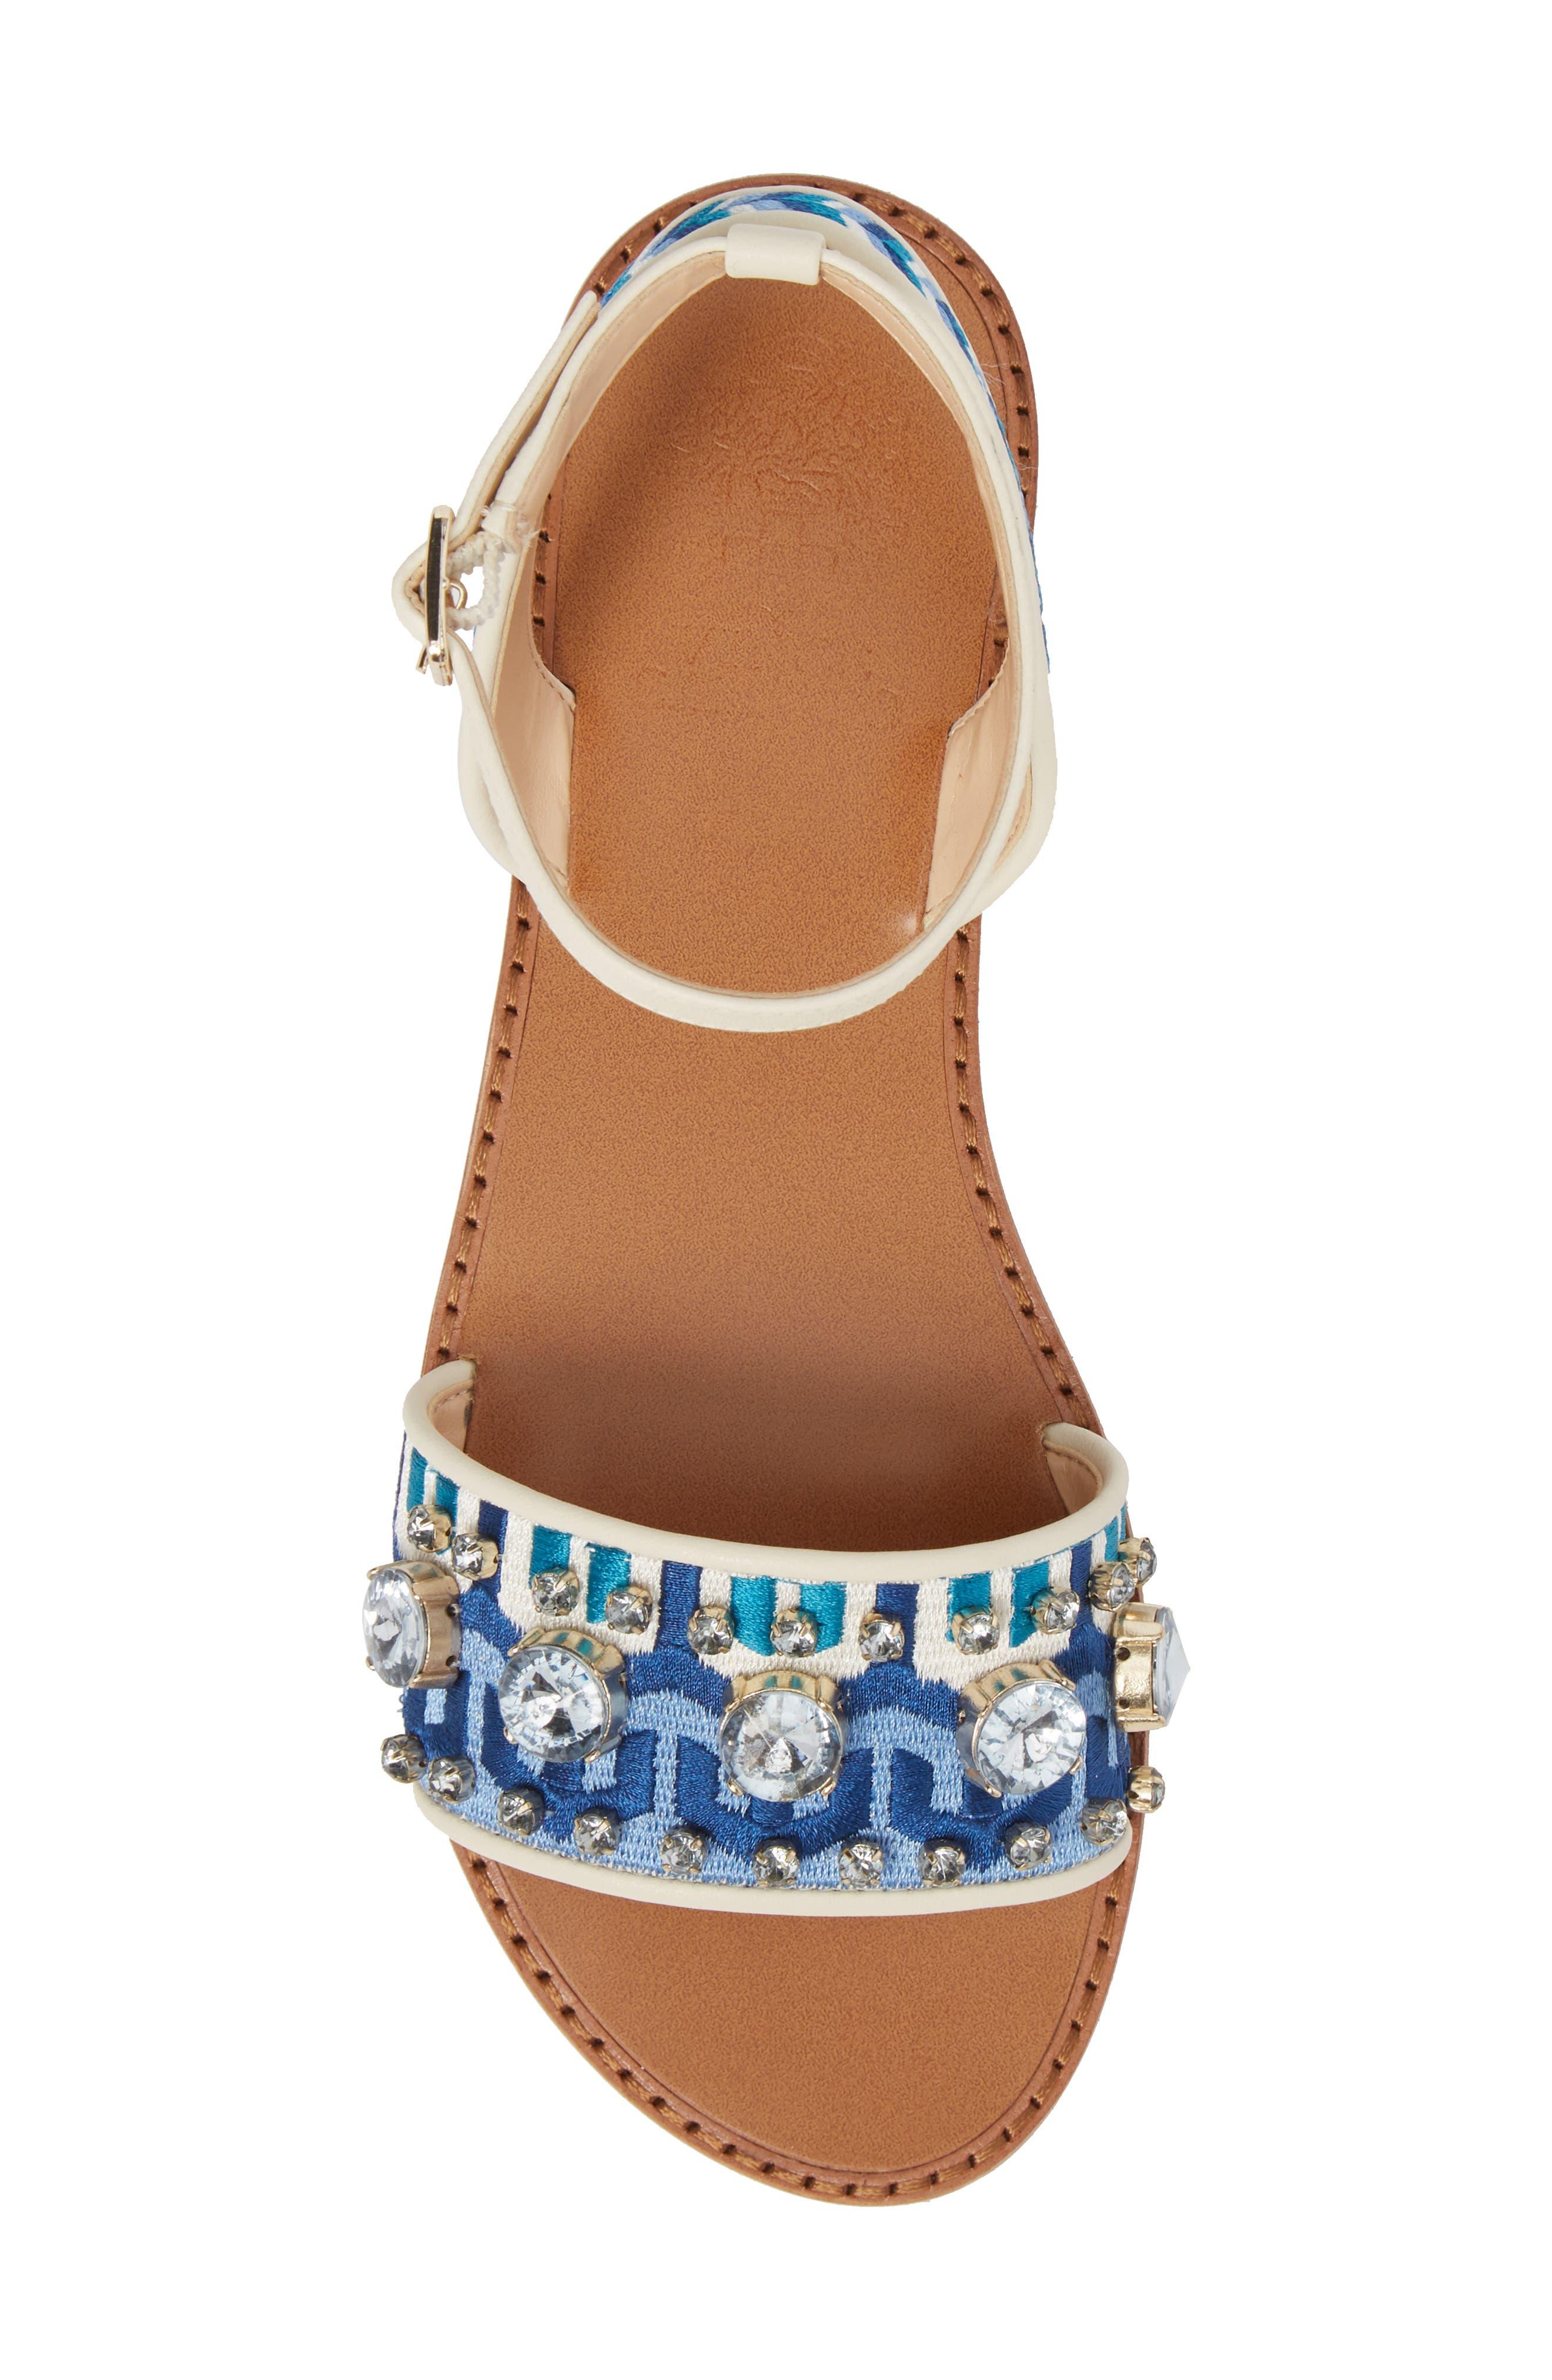 Akitta Sandal,                             Alternate thumbnail 5, color,                             Blue Multi/ Vanilla Fabric